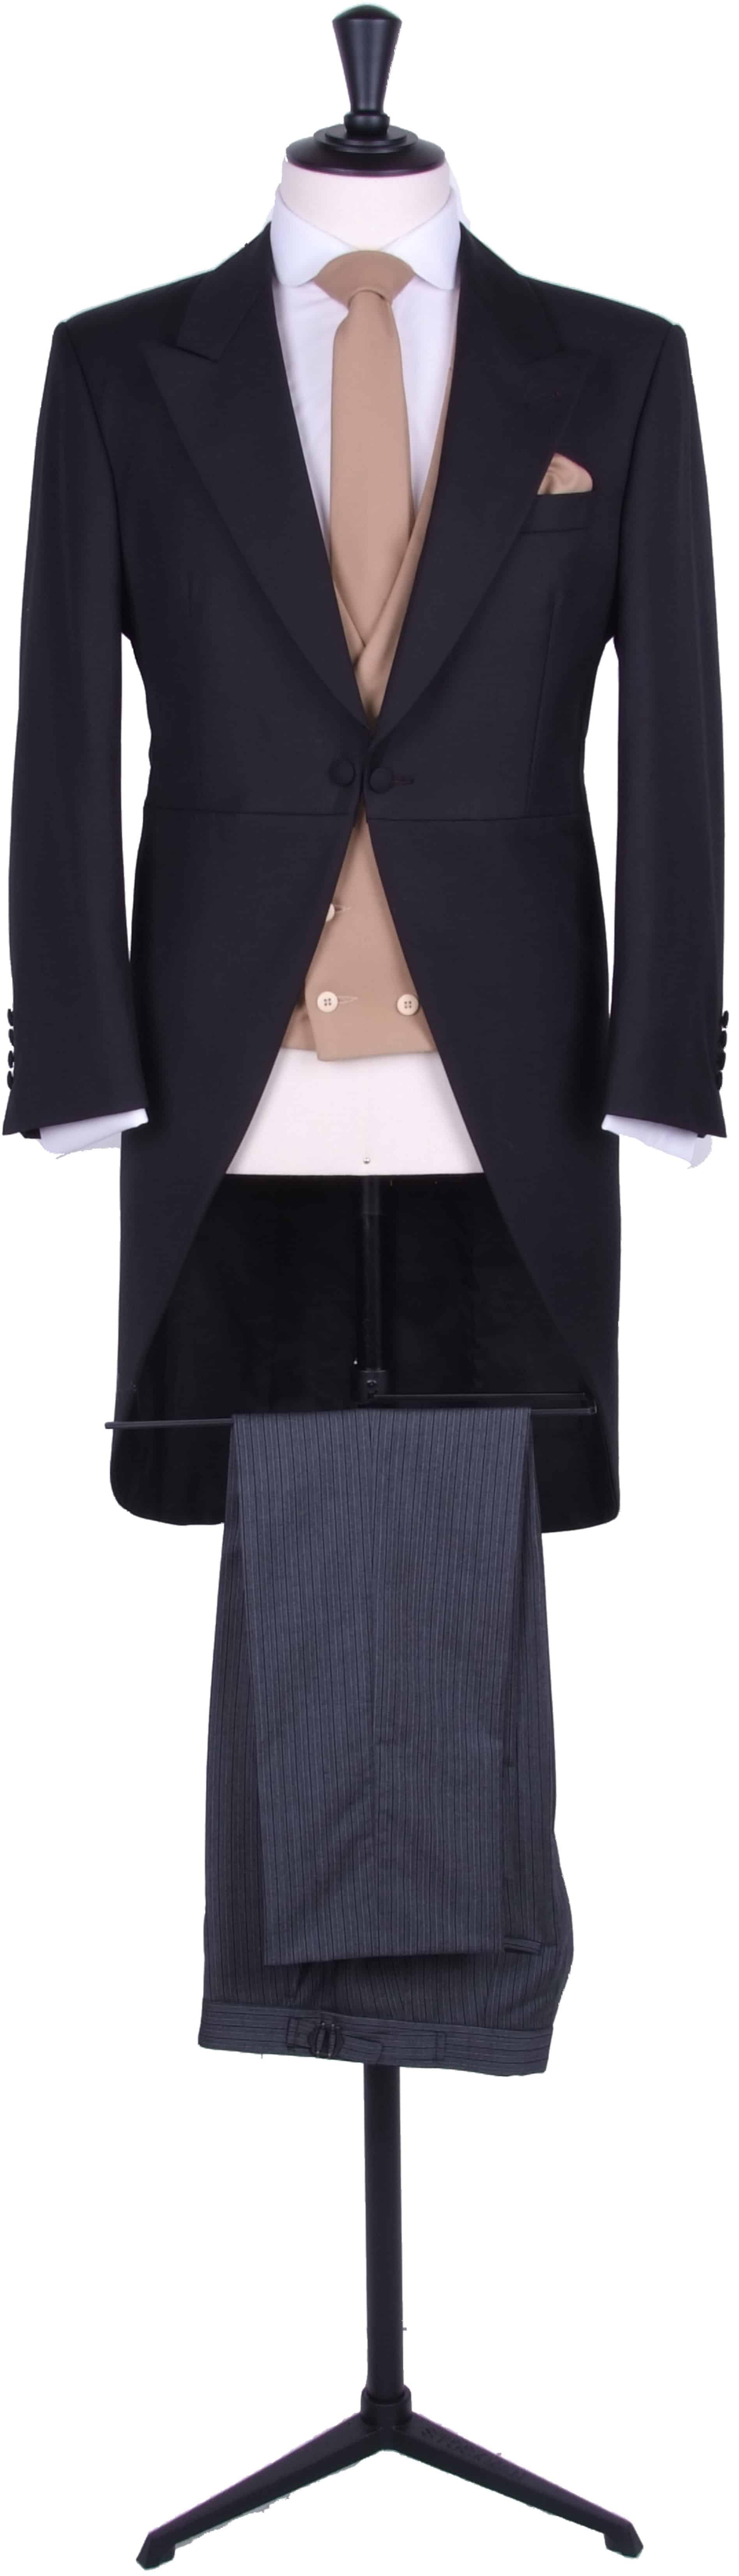 Light weight tailcoat suit